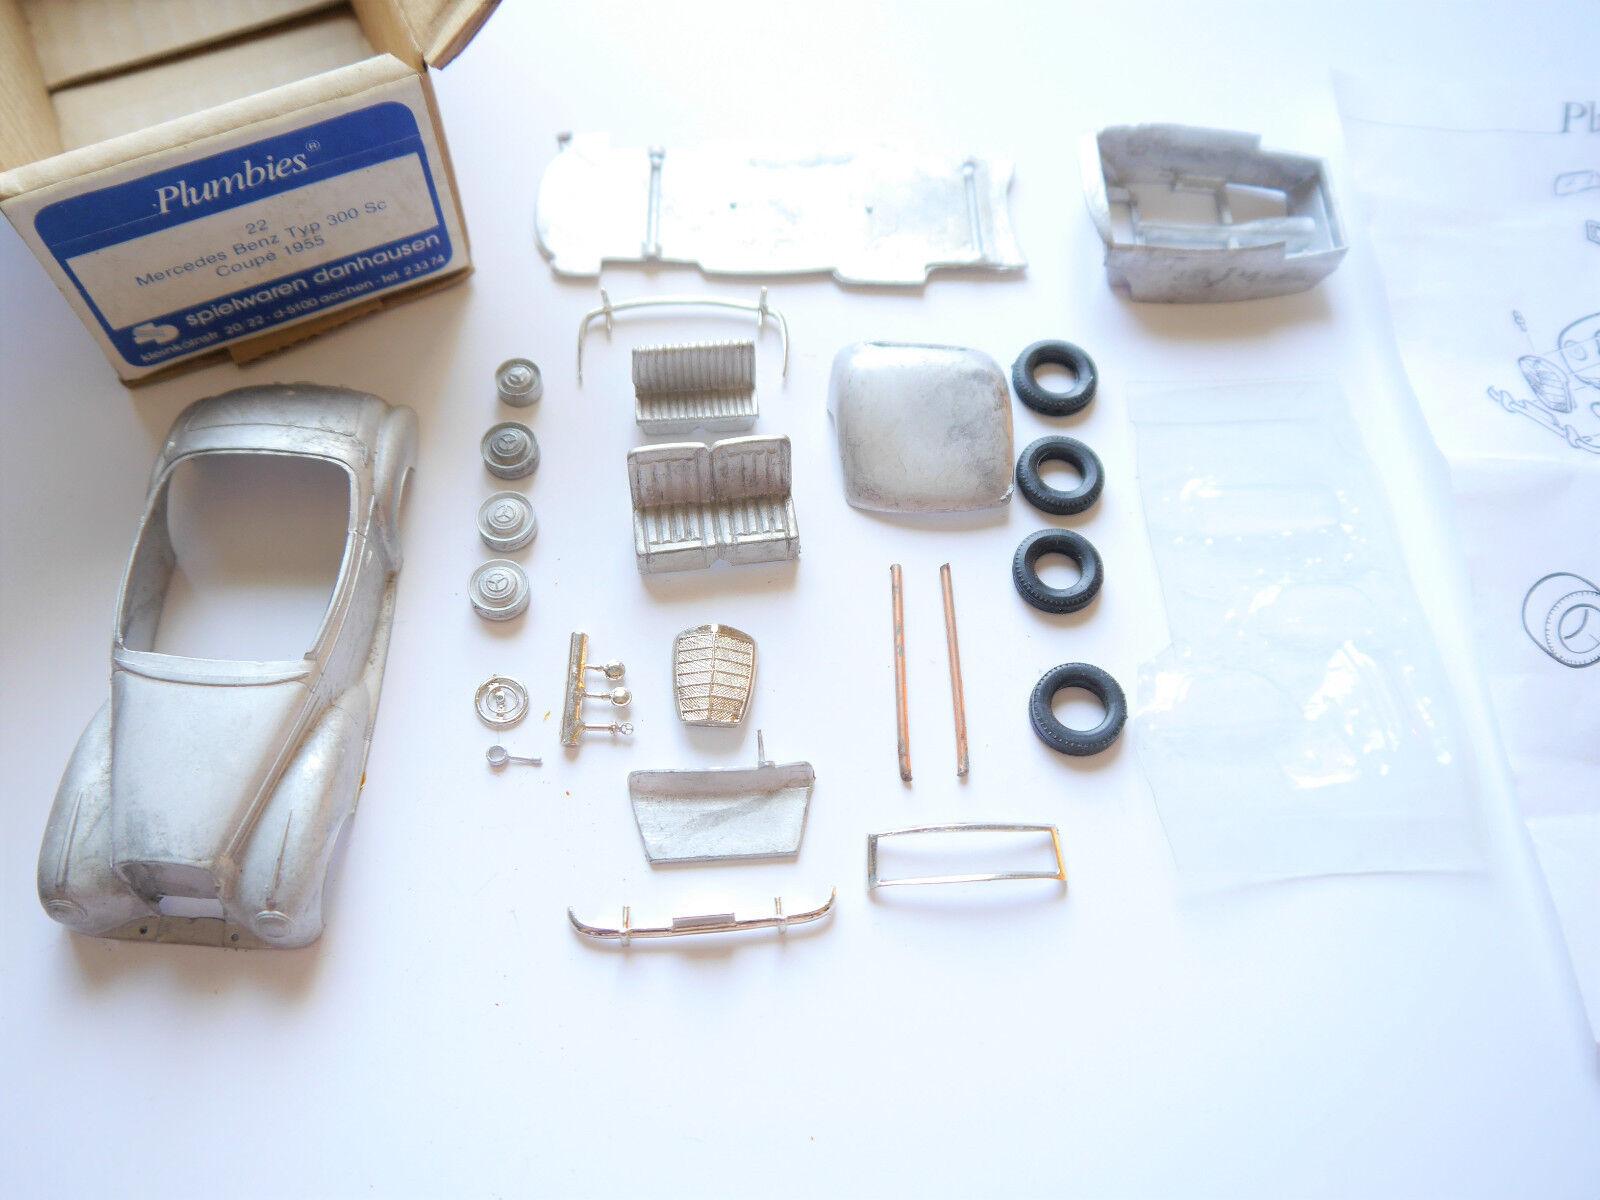 MERCEDES MERCEDES MERCEDES Type 300 SC Coupe 1955, blancmetall-Kit WM-Kit Plumbies 22 1 43 en Boîte b5028e